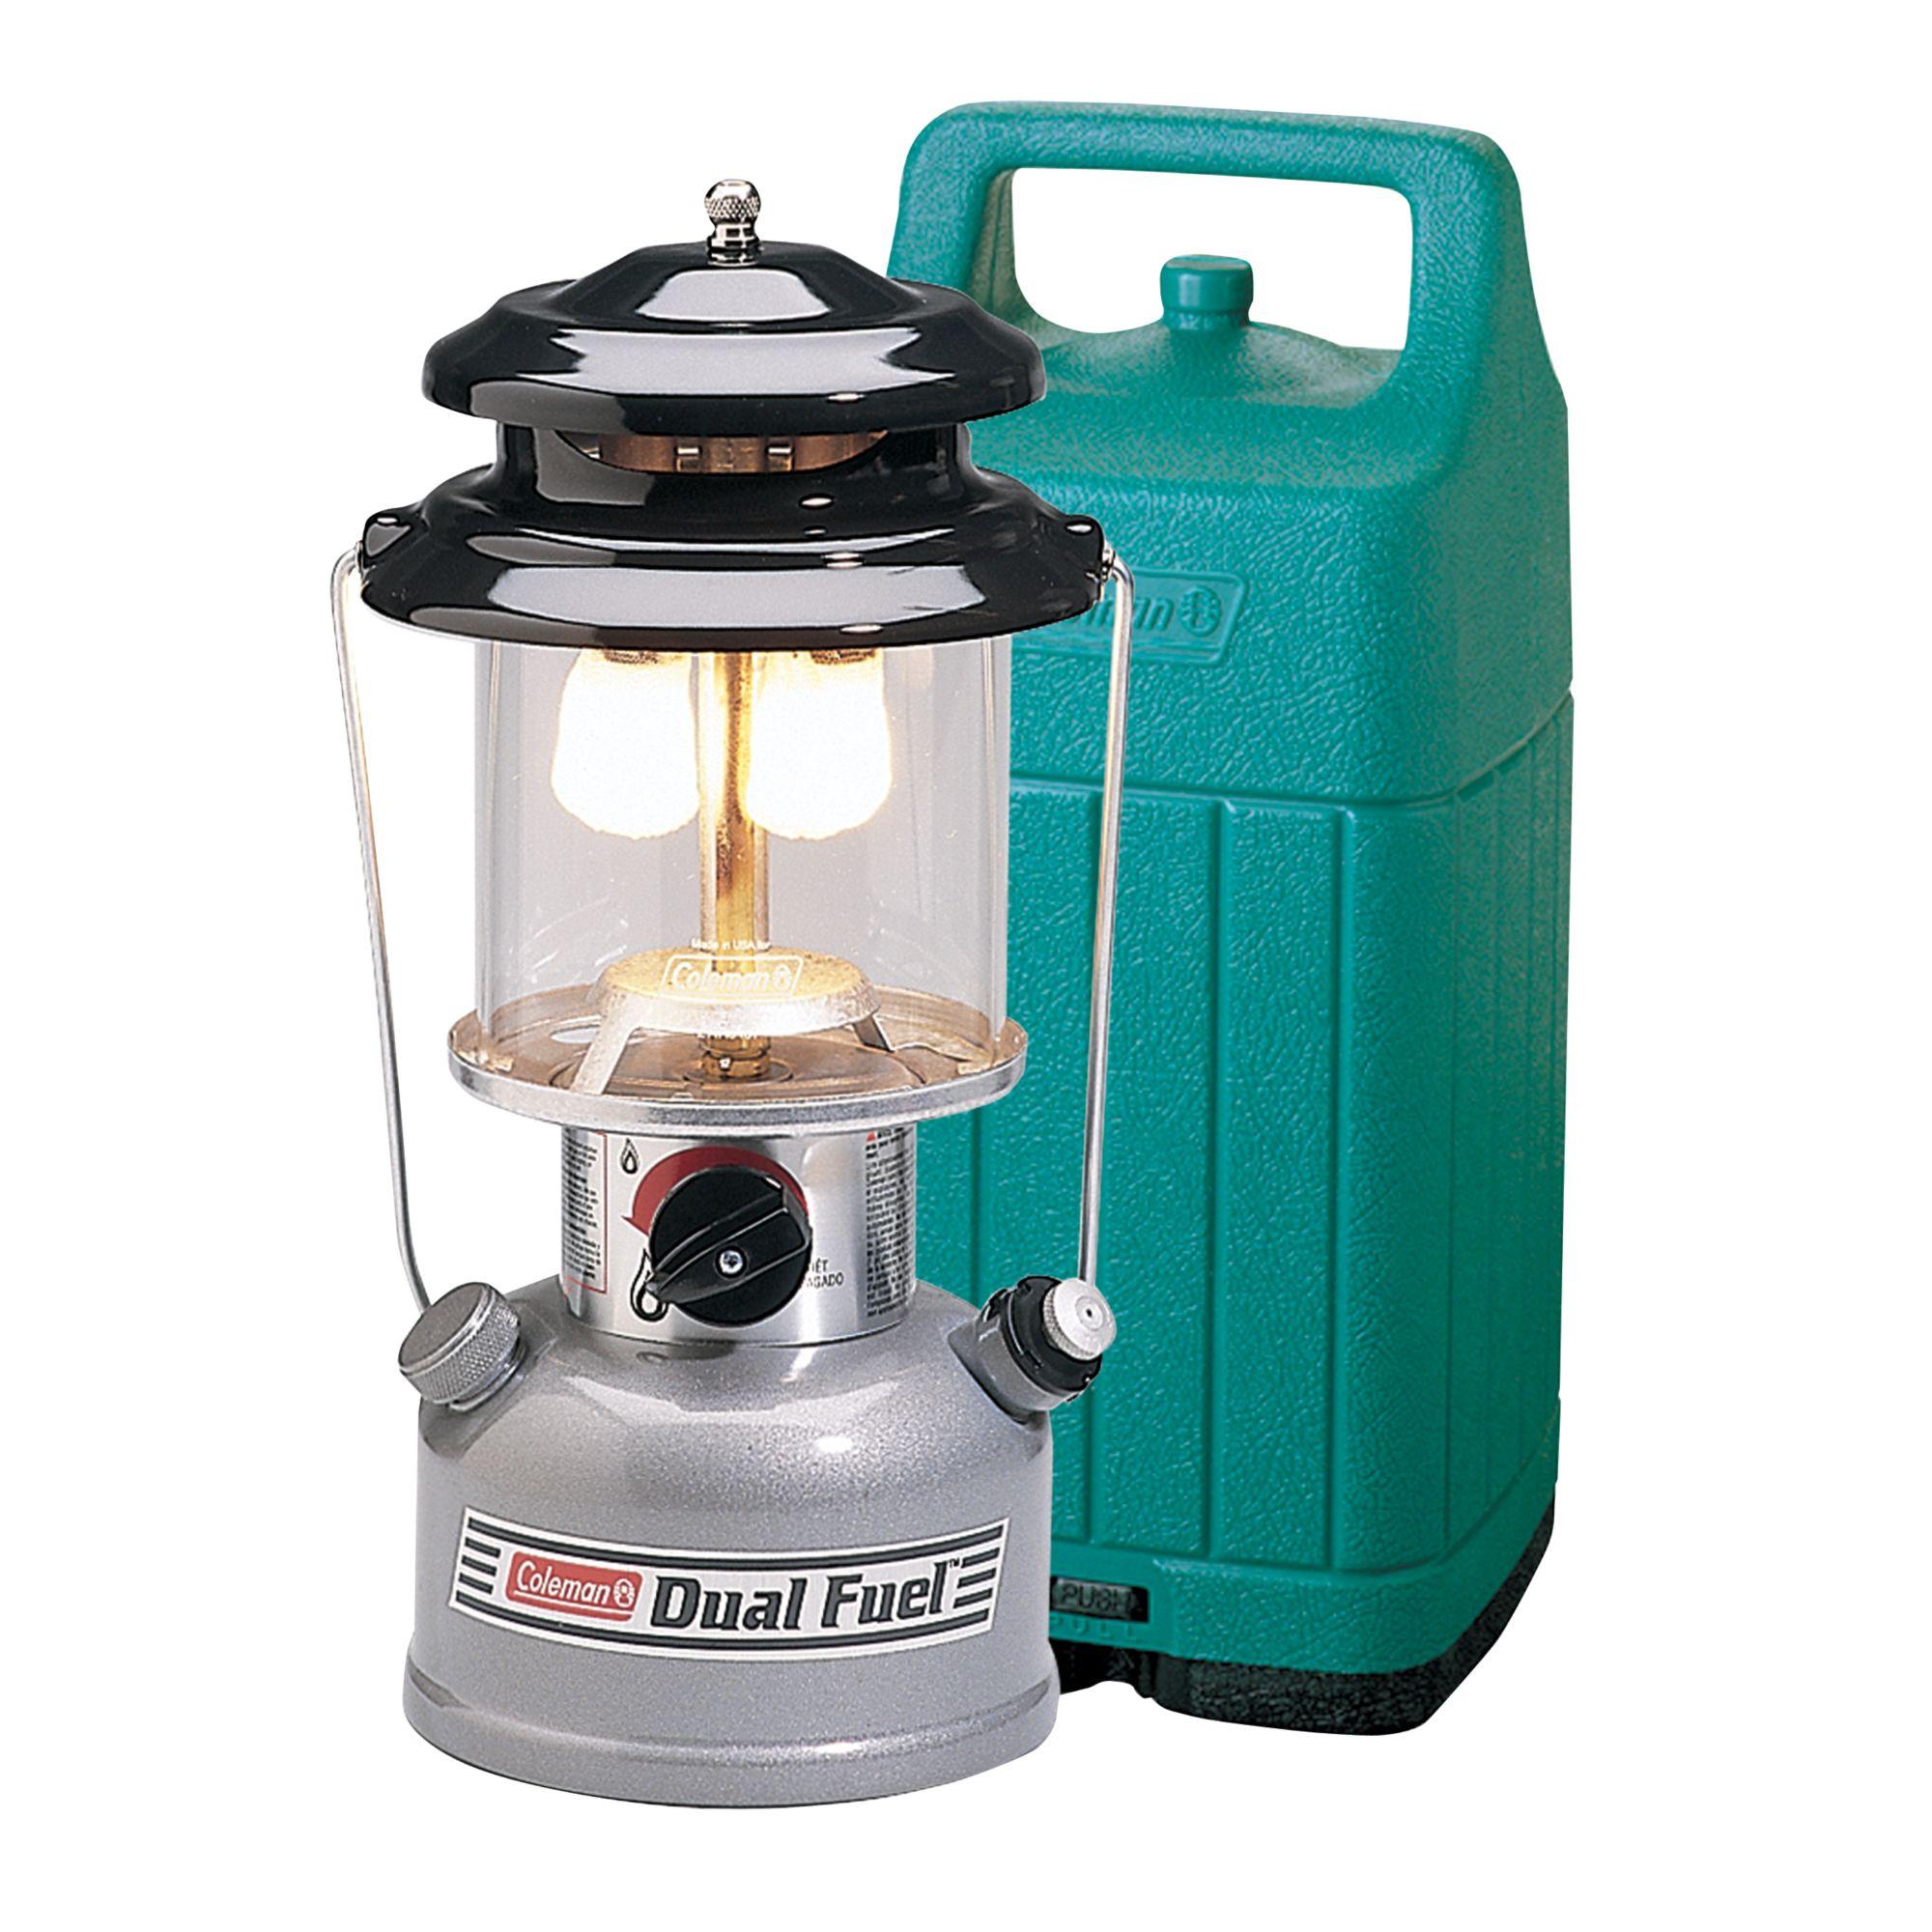 lantern lamp propane northstar instastart hero wid perfectflow coleman hei